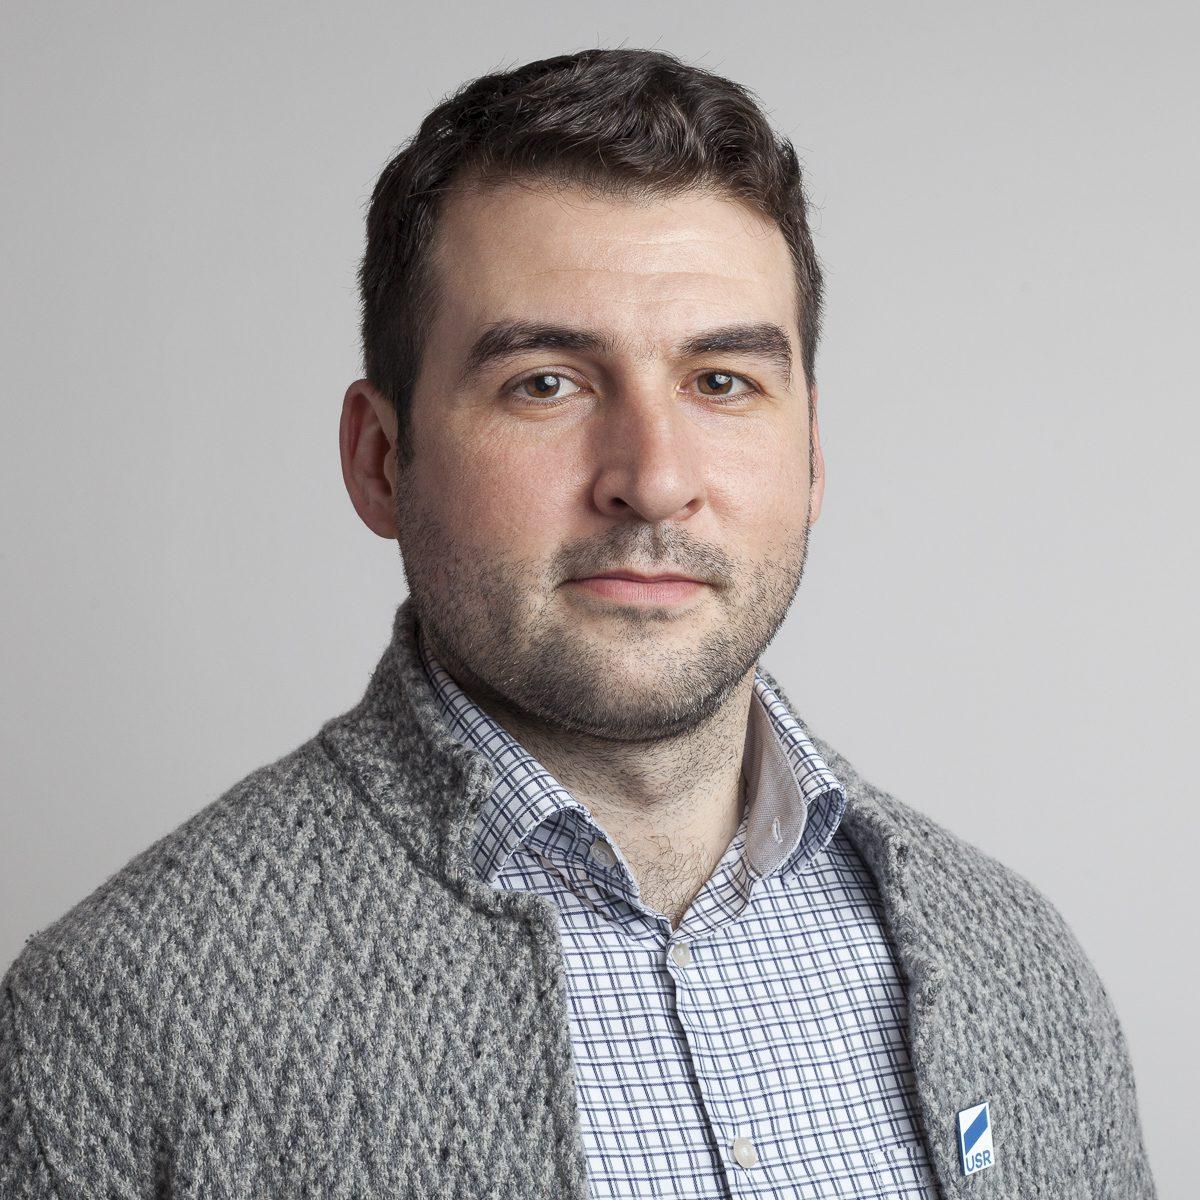 Mihai Vădan